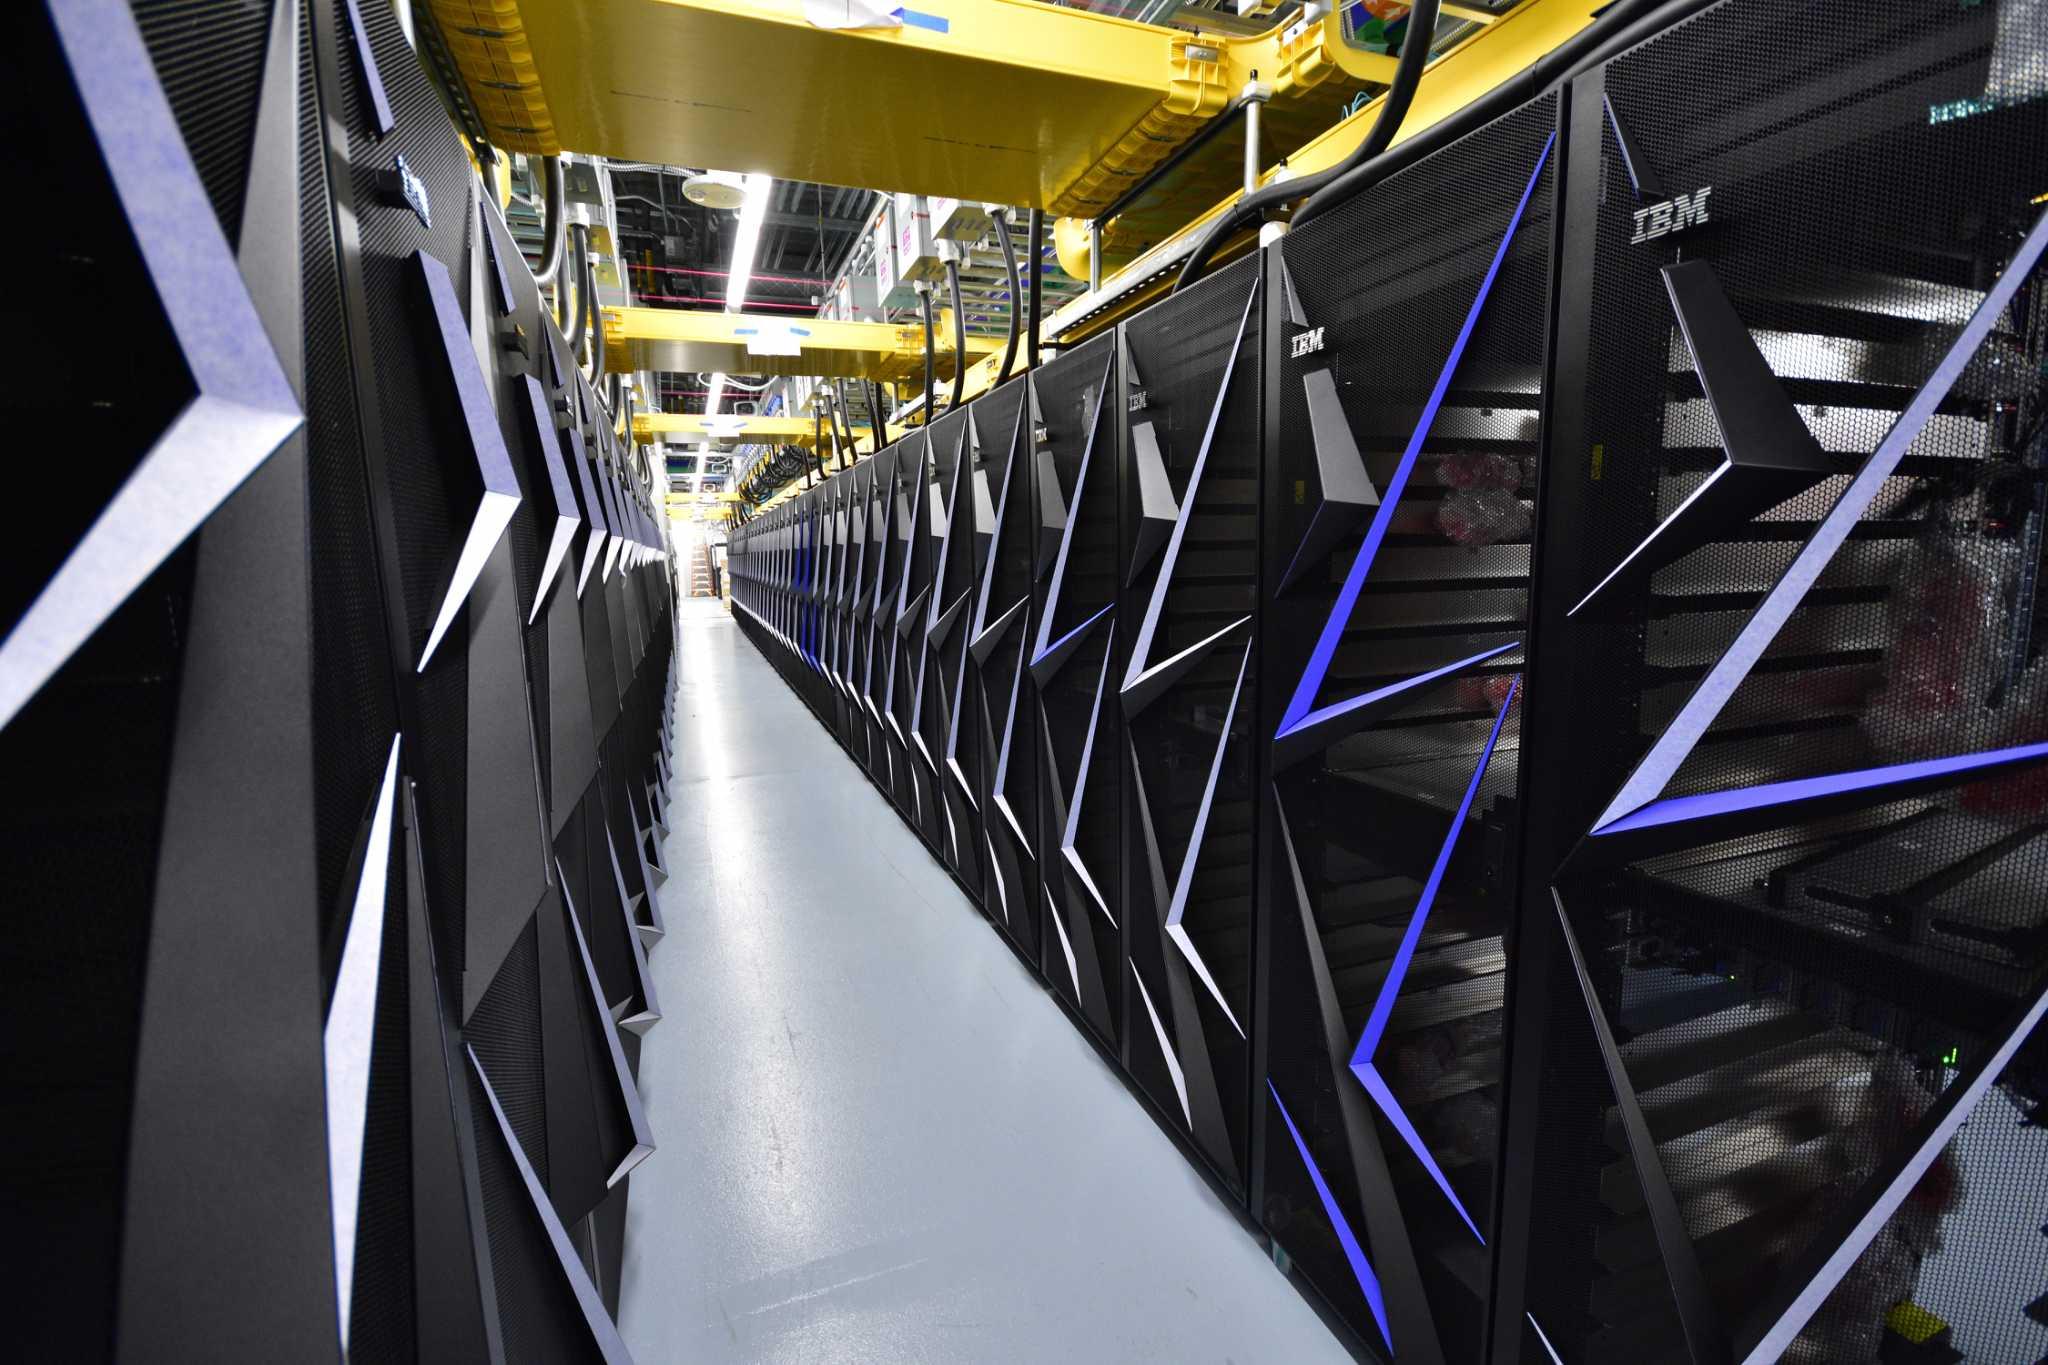 2fca7d08ba82 GlobalFoundries helping U.S. regain supercomputing lead - Times Union